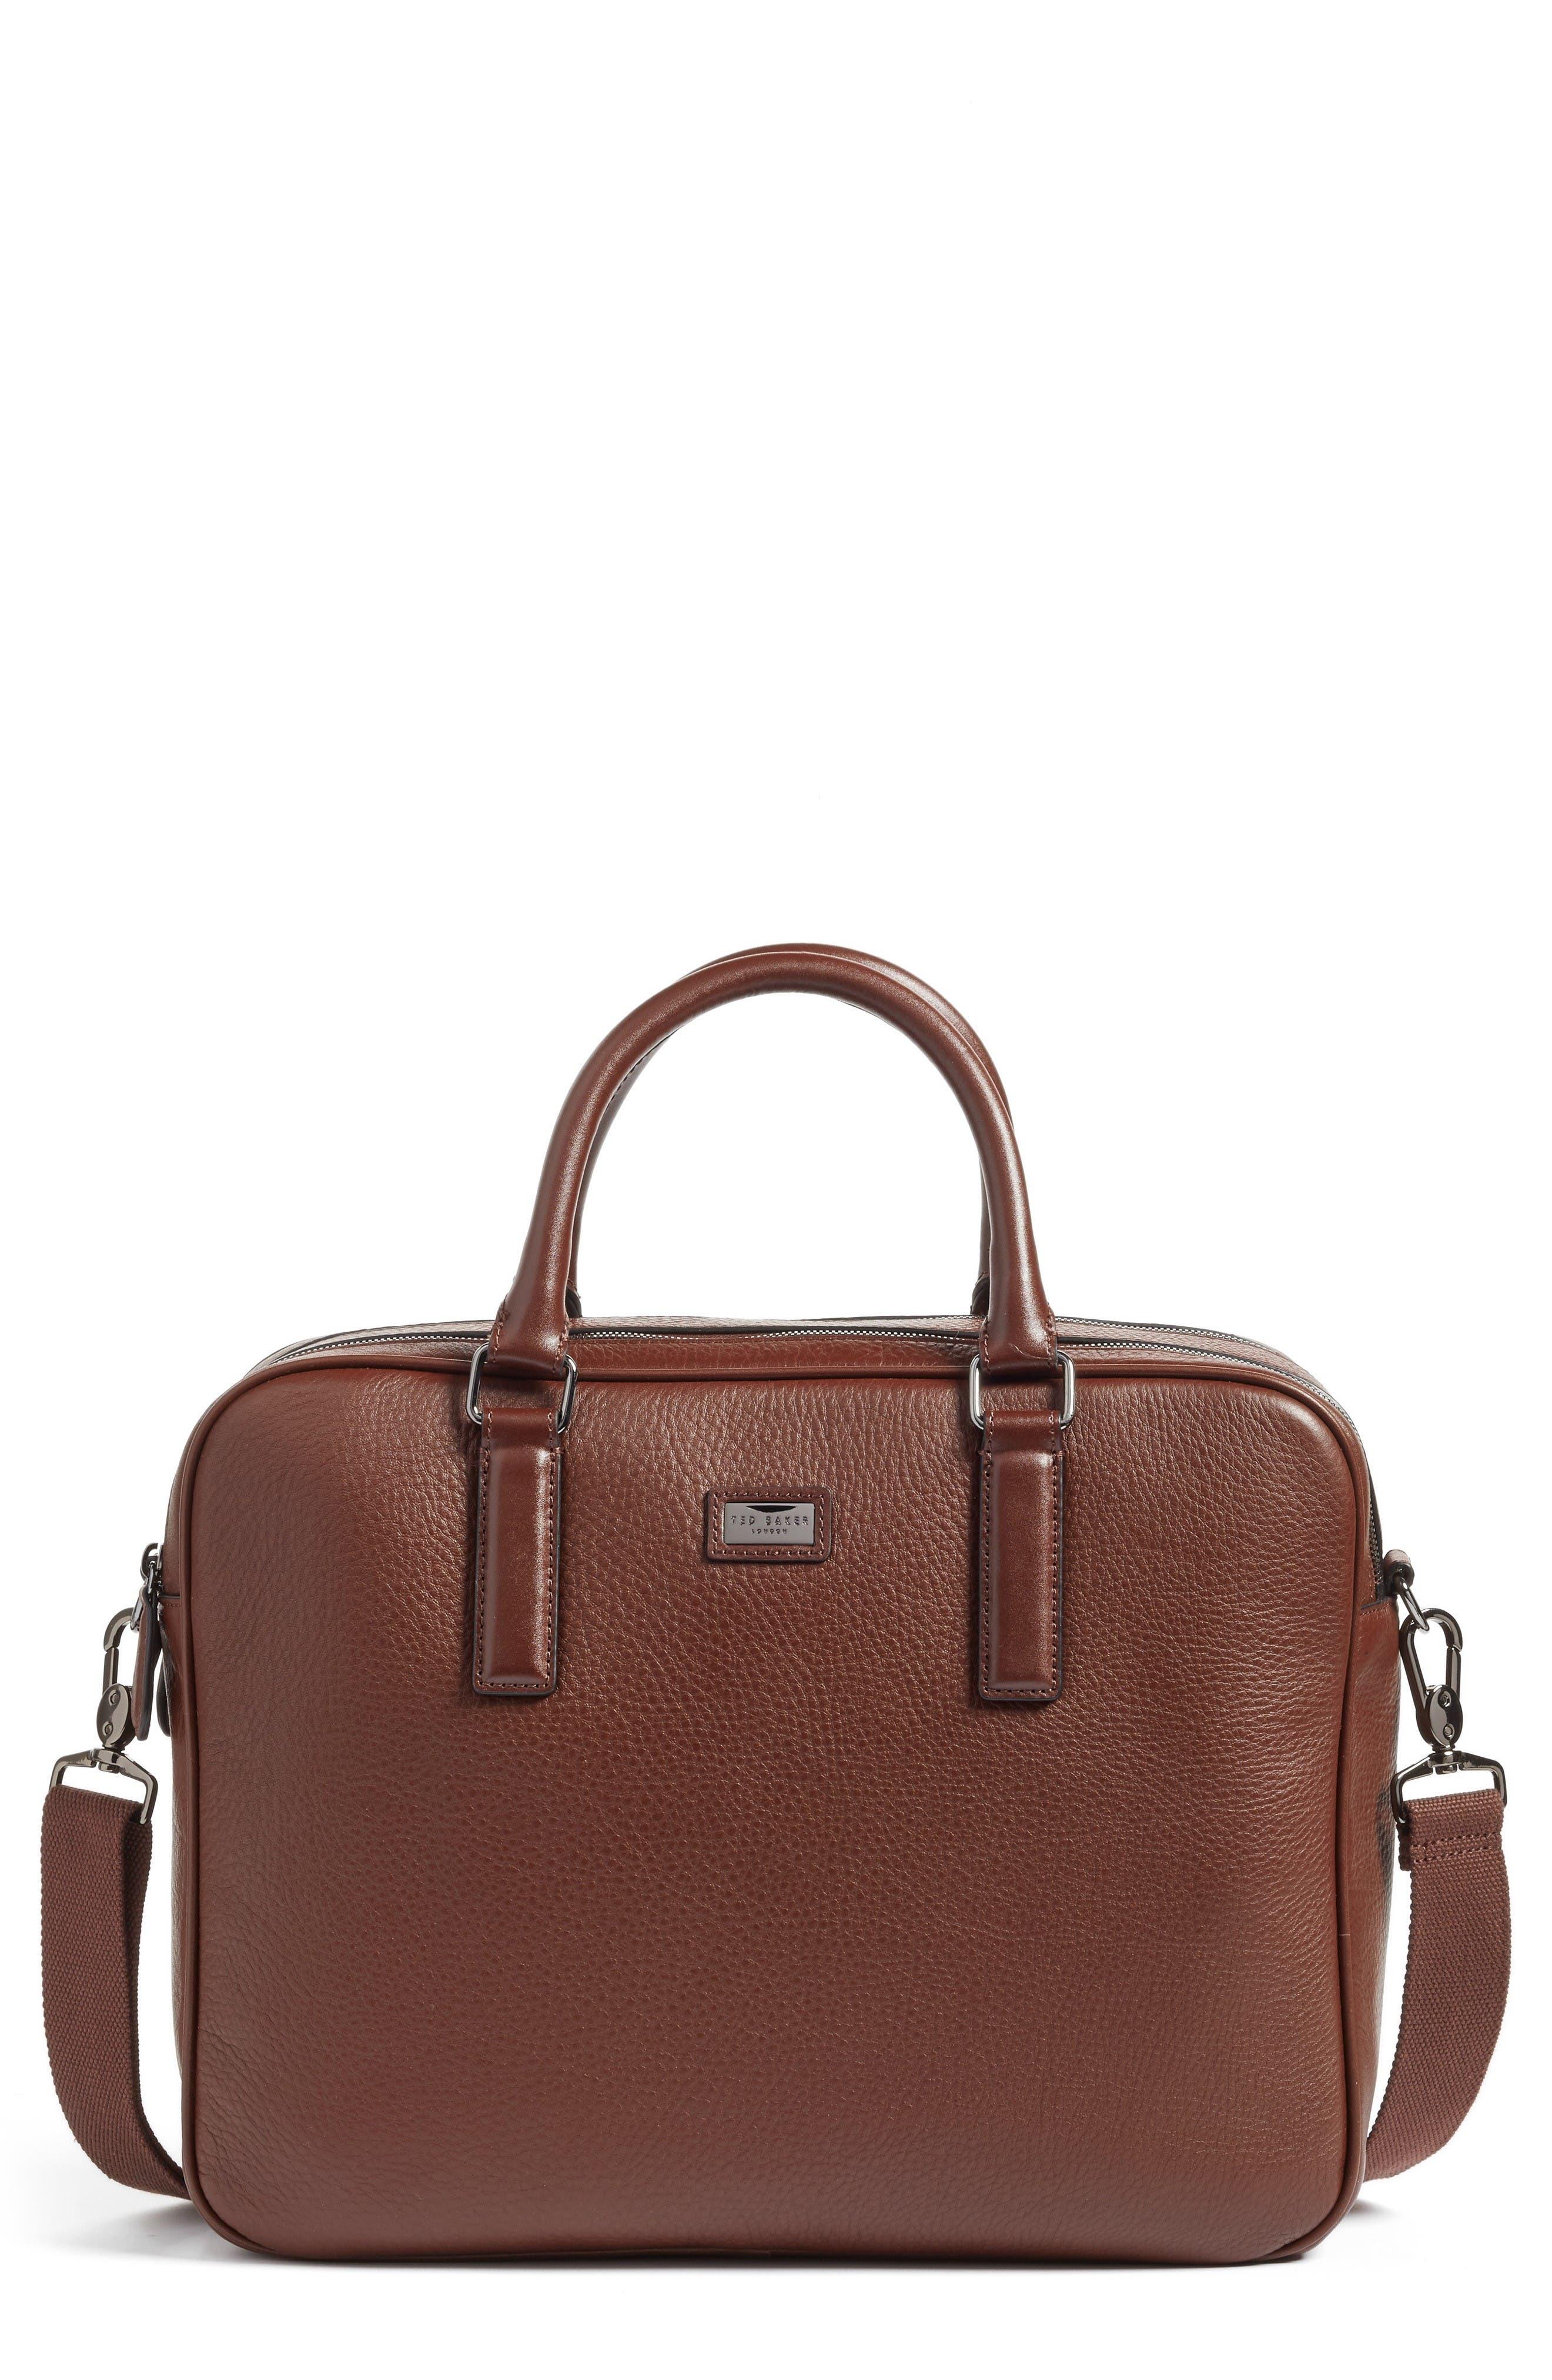 Alternate Image 1 Selected - Ted Baker London Leather Document Bag